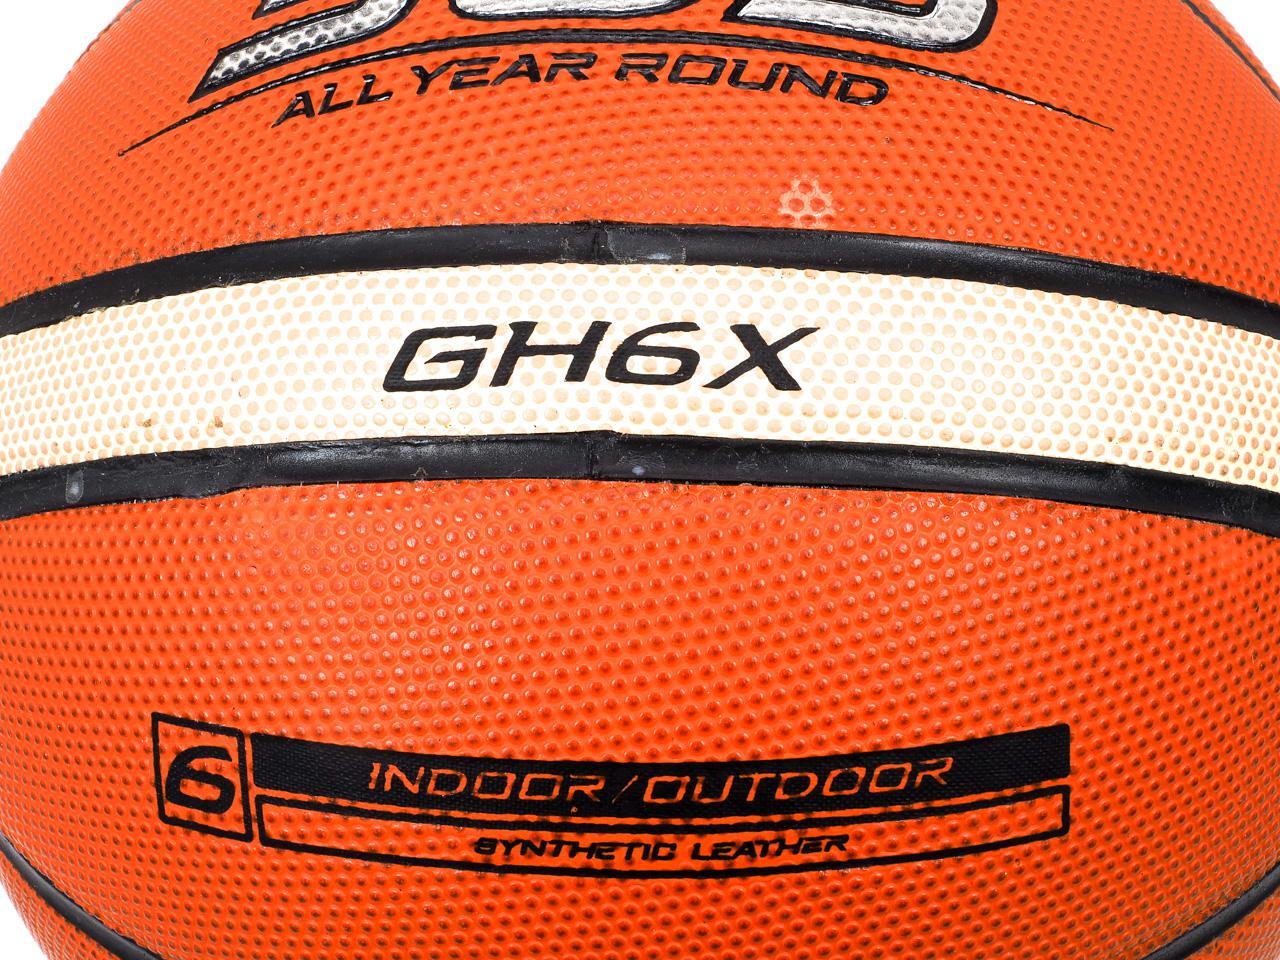 Ball-Of-Basketball-Molten-Gh6x-Training-Indoor-Orange-41622-New thumbnail 2